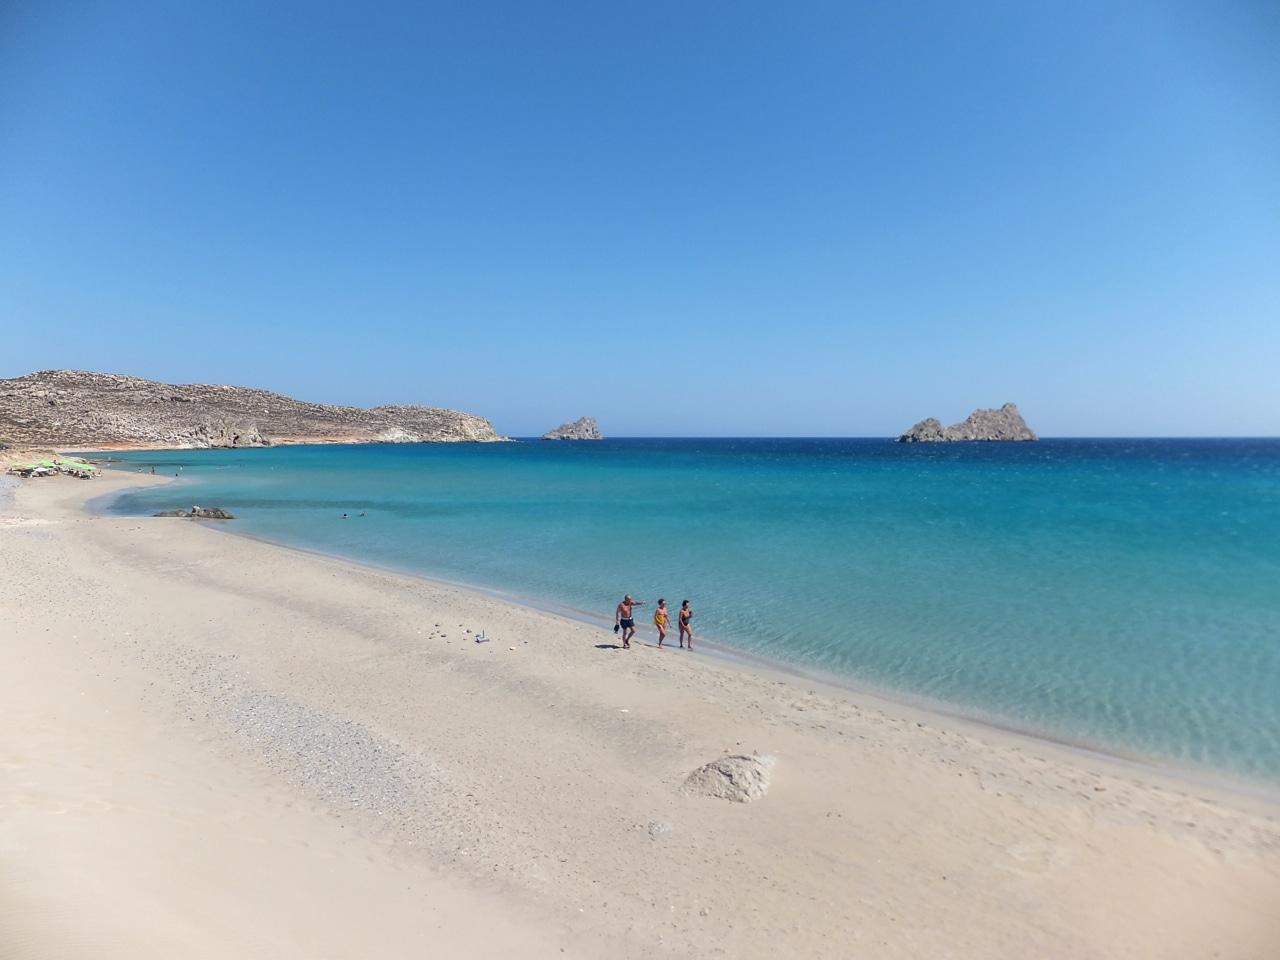 xerokambos travel guide, xerokampos beach east Crete, xerokambos village crete, xerokambos hotels villas, xerokambos activities, where to eat xerokabos